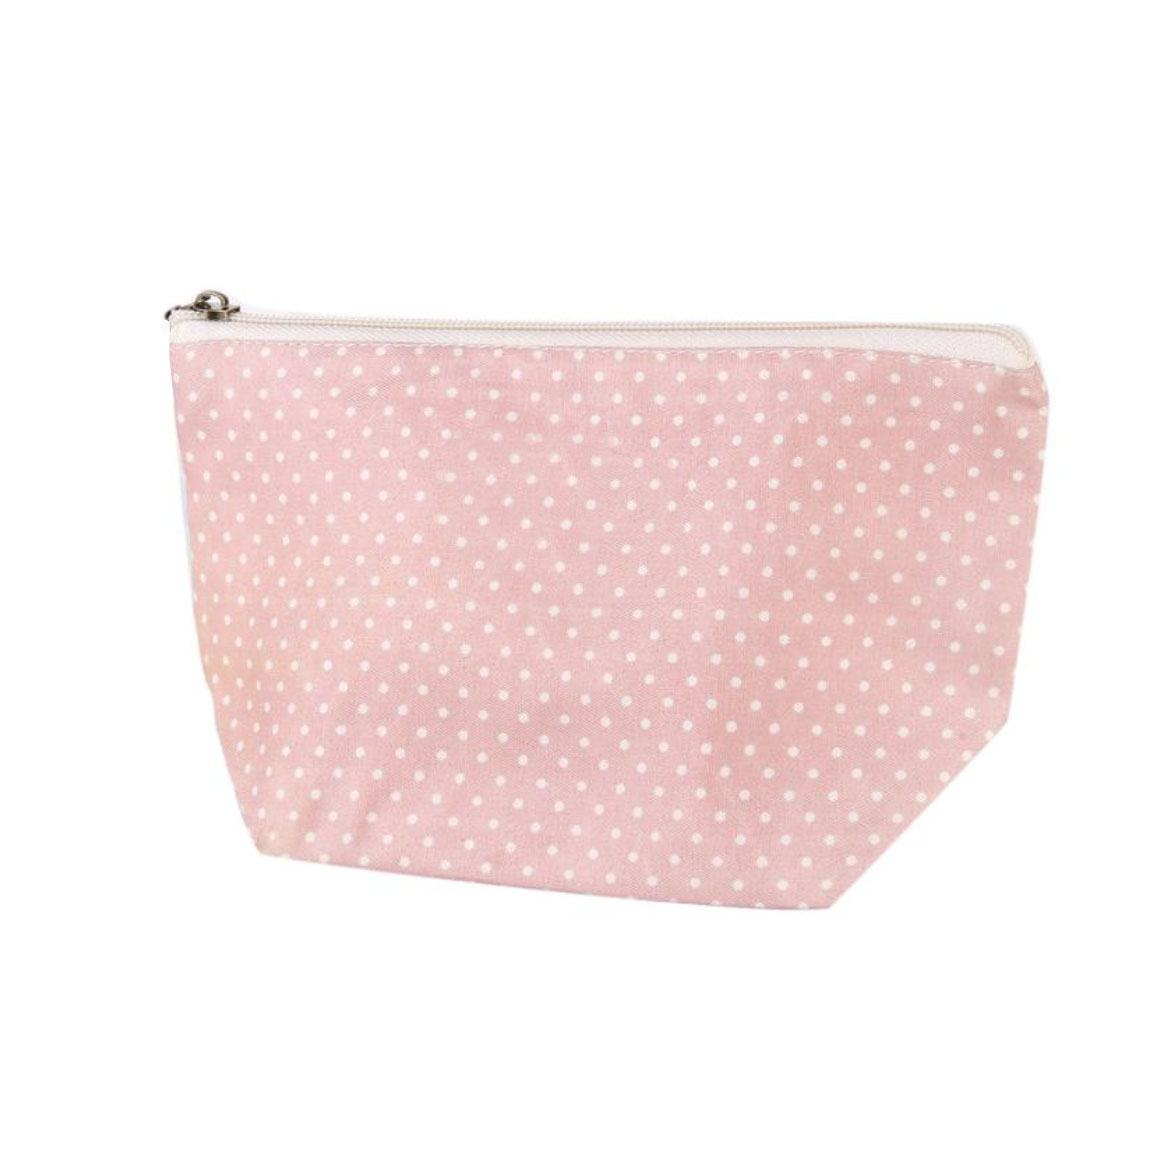 154f883018a2 Pink Polkadot Cotton Cosmetic Bag